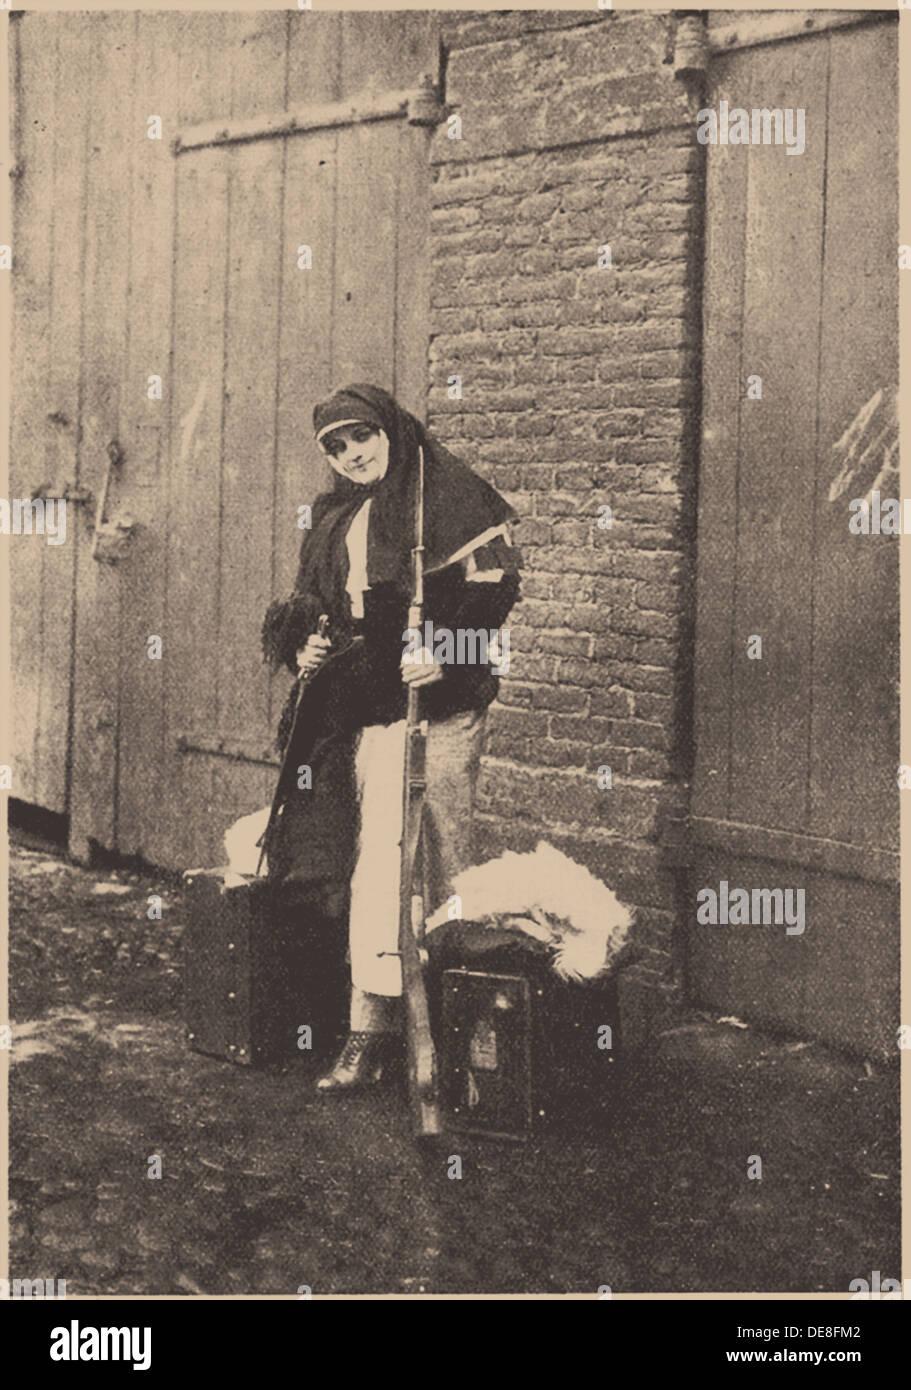 Nadezhda Teffi (1872-1952) as Nurse during World War I. Artist: Anonymous - Stock Image